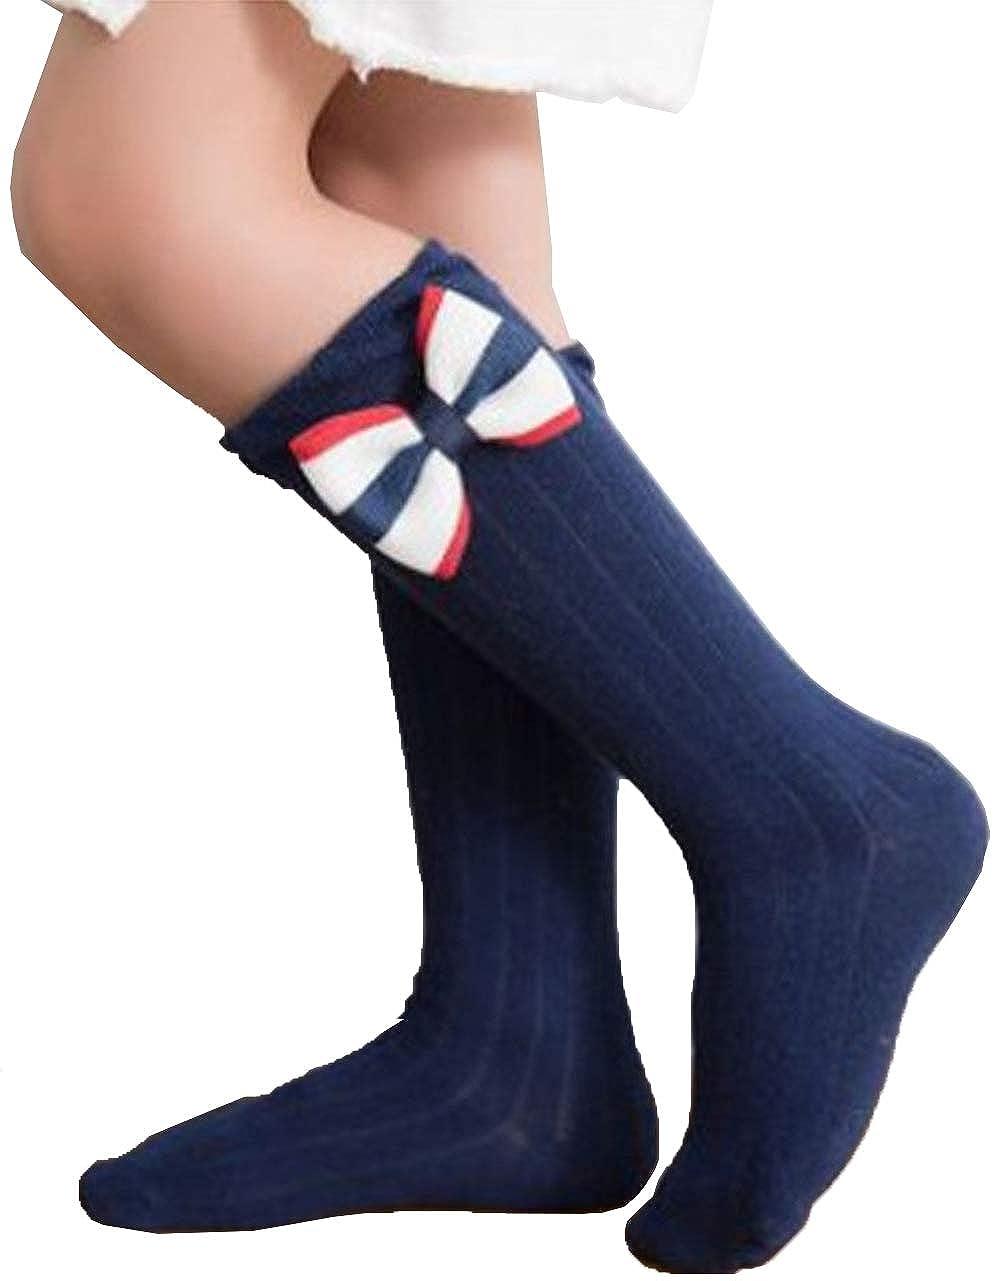 TUSFTAY Kid Baby Girls Knit Bow Socks Cotton Stockings